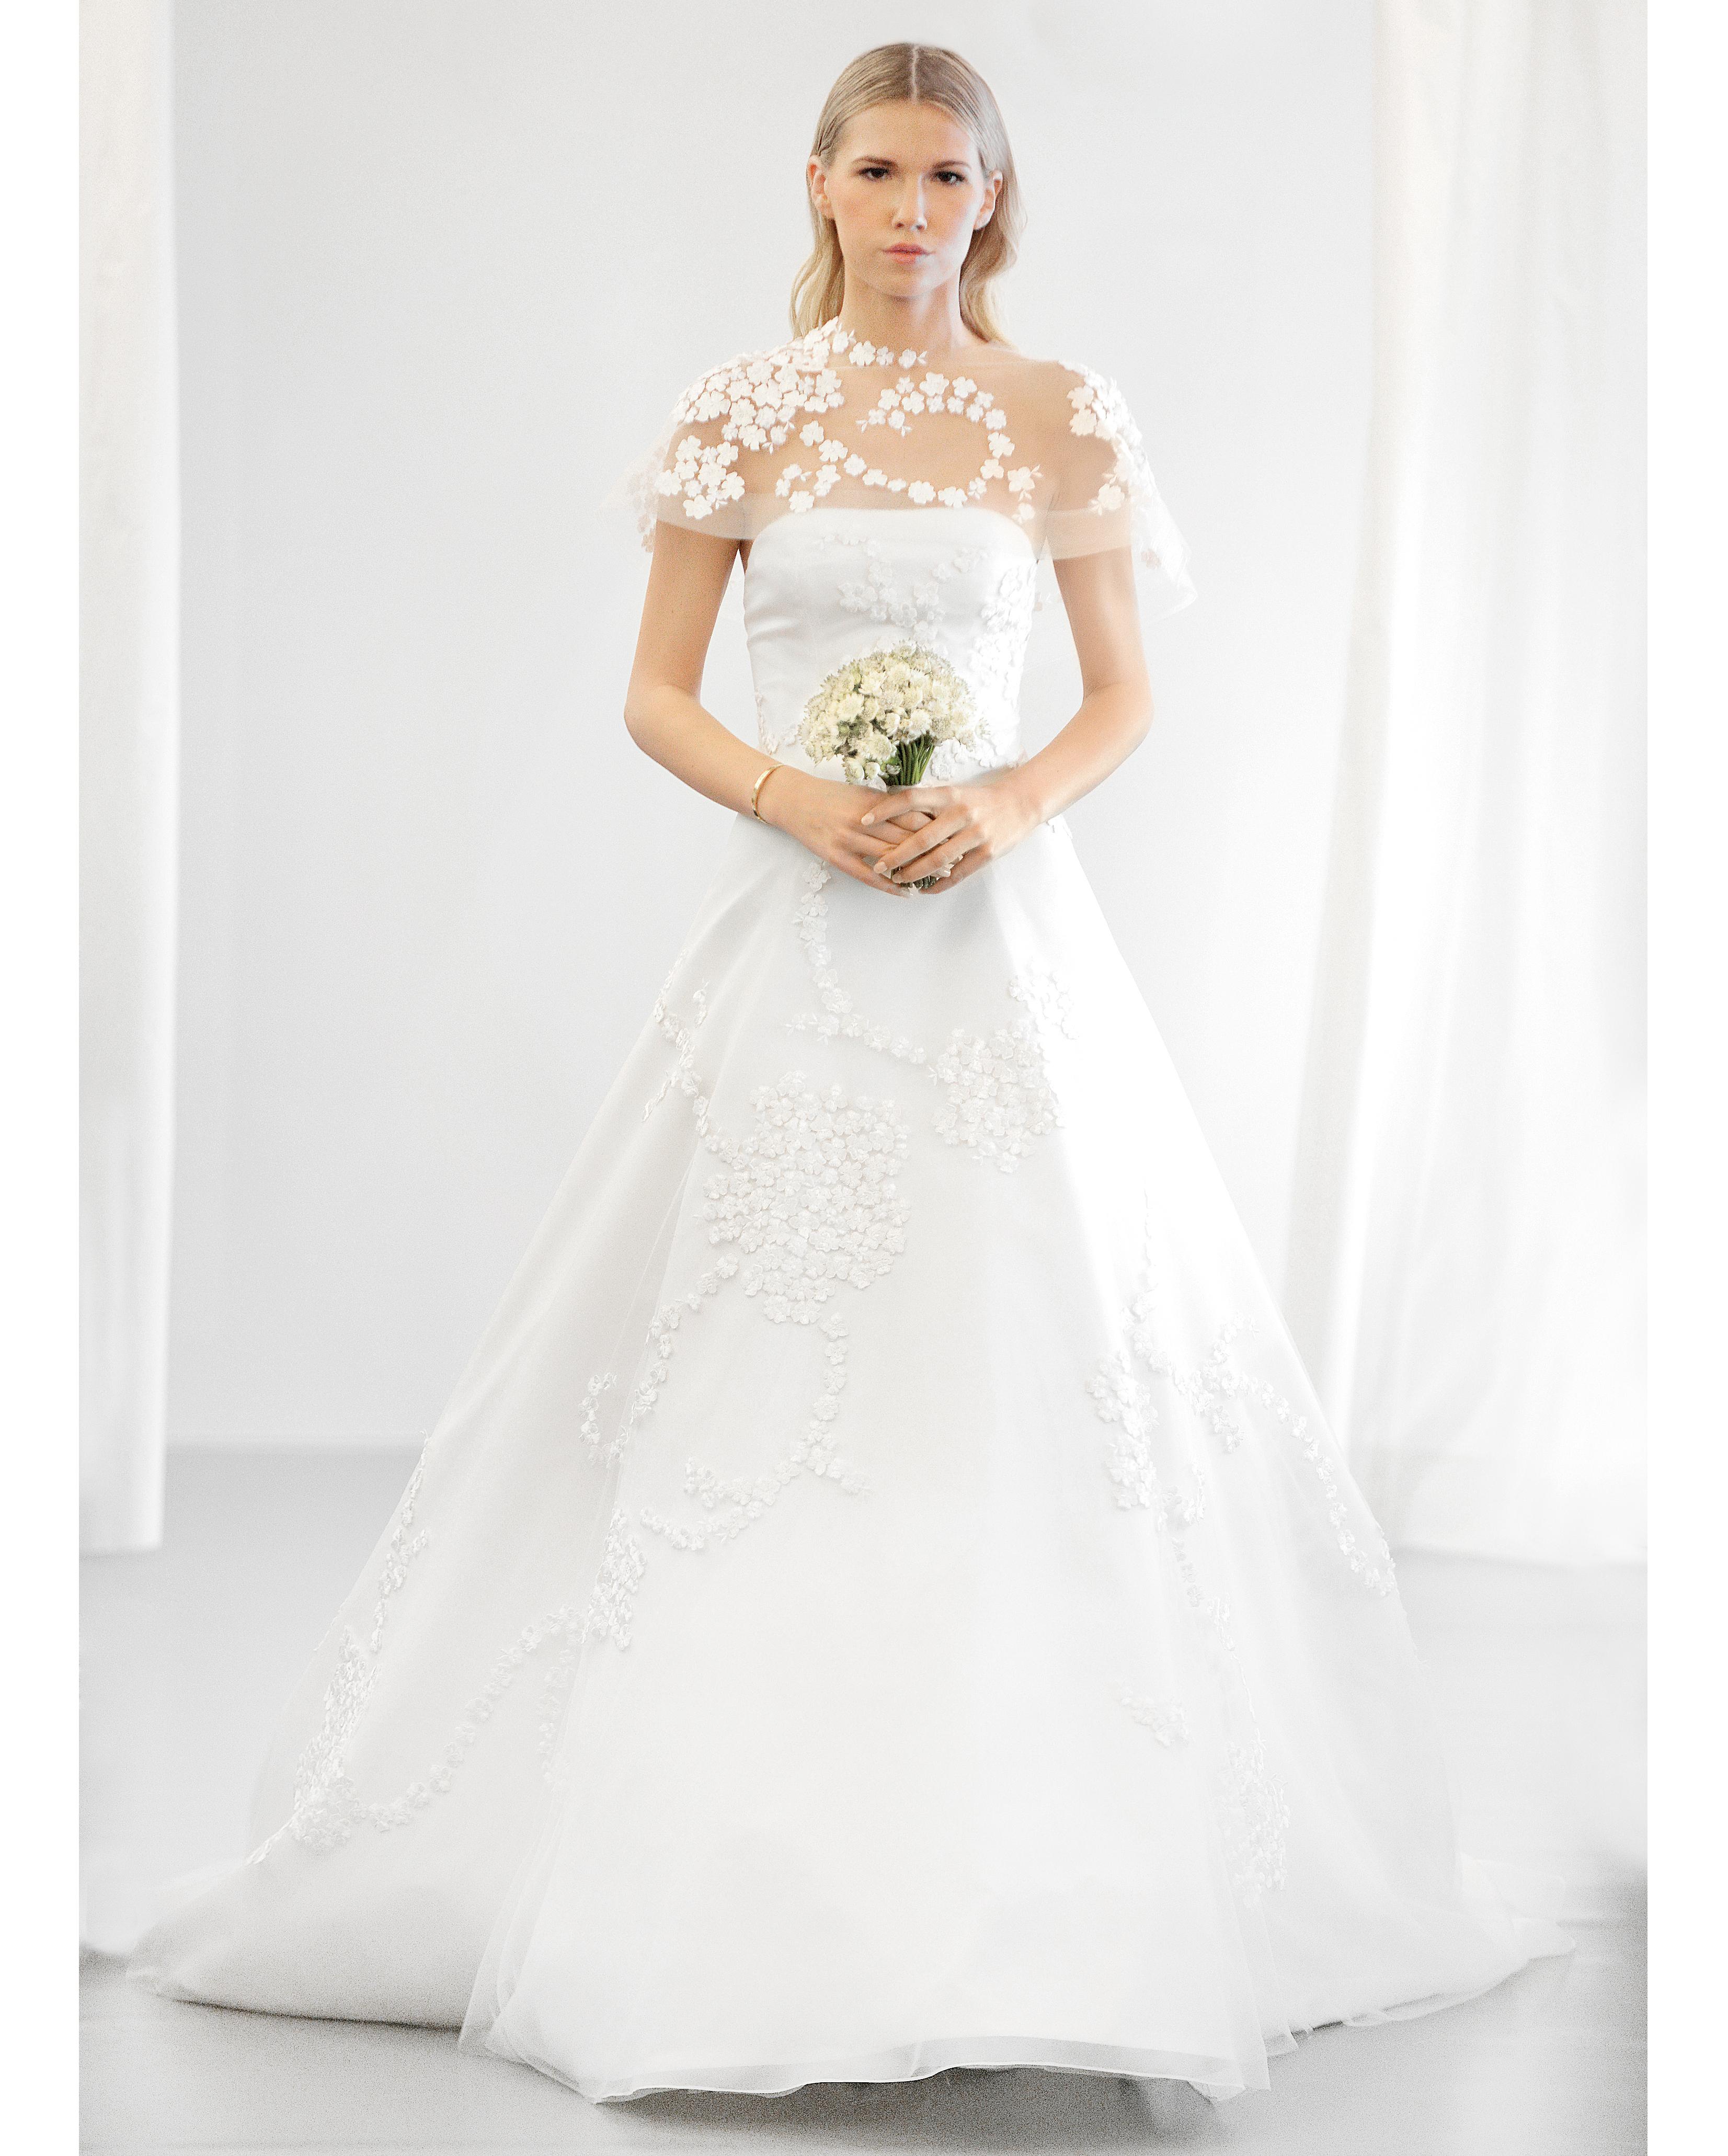 50-states-wedding-dresses-connecticut-angel-sanchez-fall2015-wd111643-012-0615.jpg